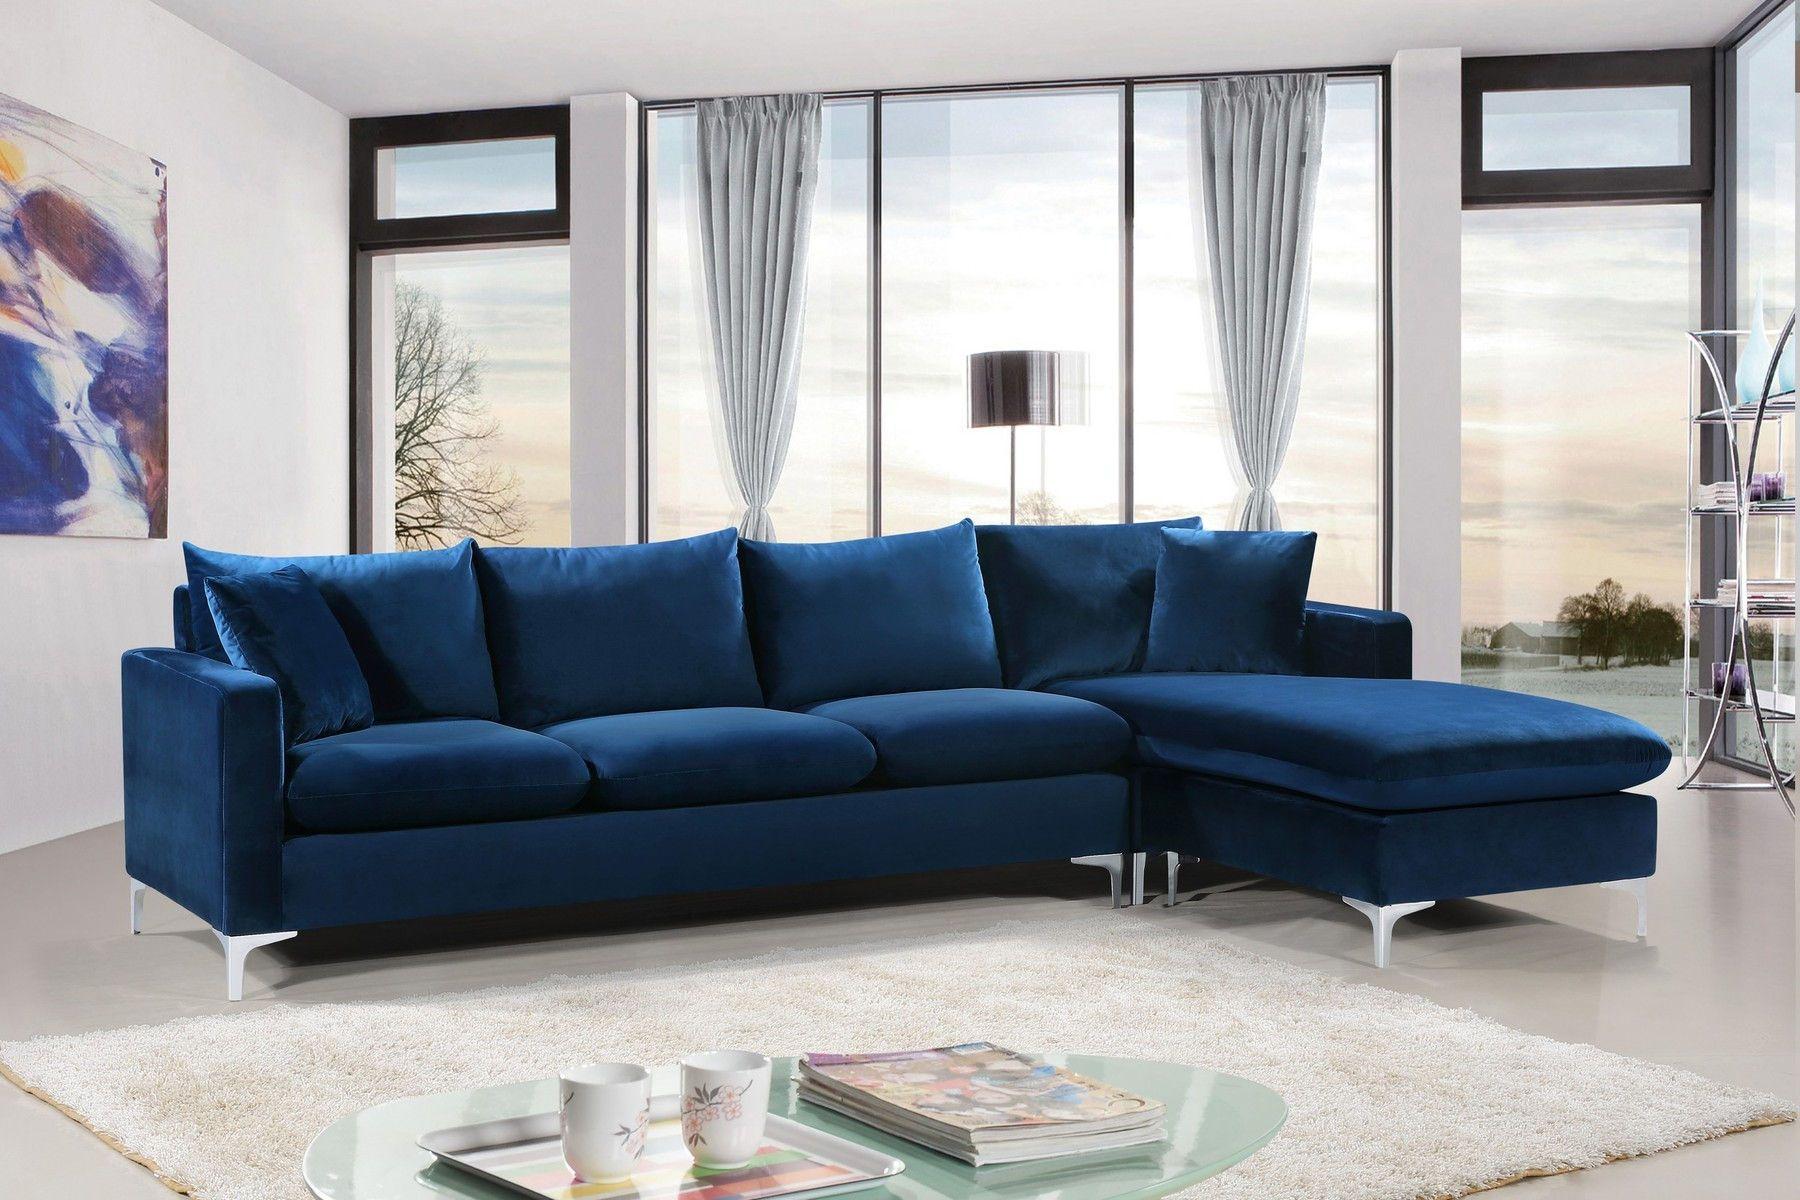 Meridian Naomi Navy Rf Contemporary Velvet Reversible Sofa Living Room Sofa Sectional Sofa Gold Sofa